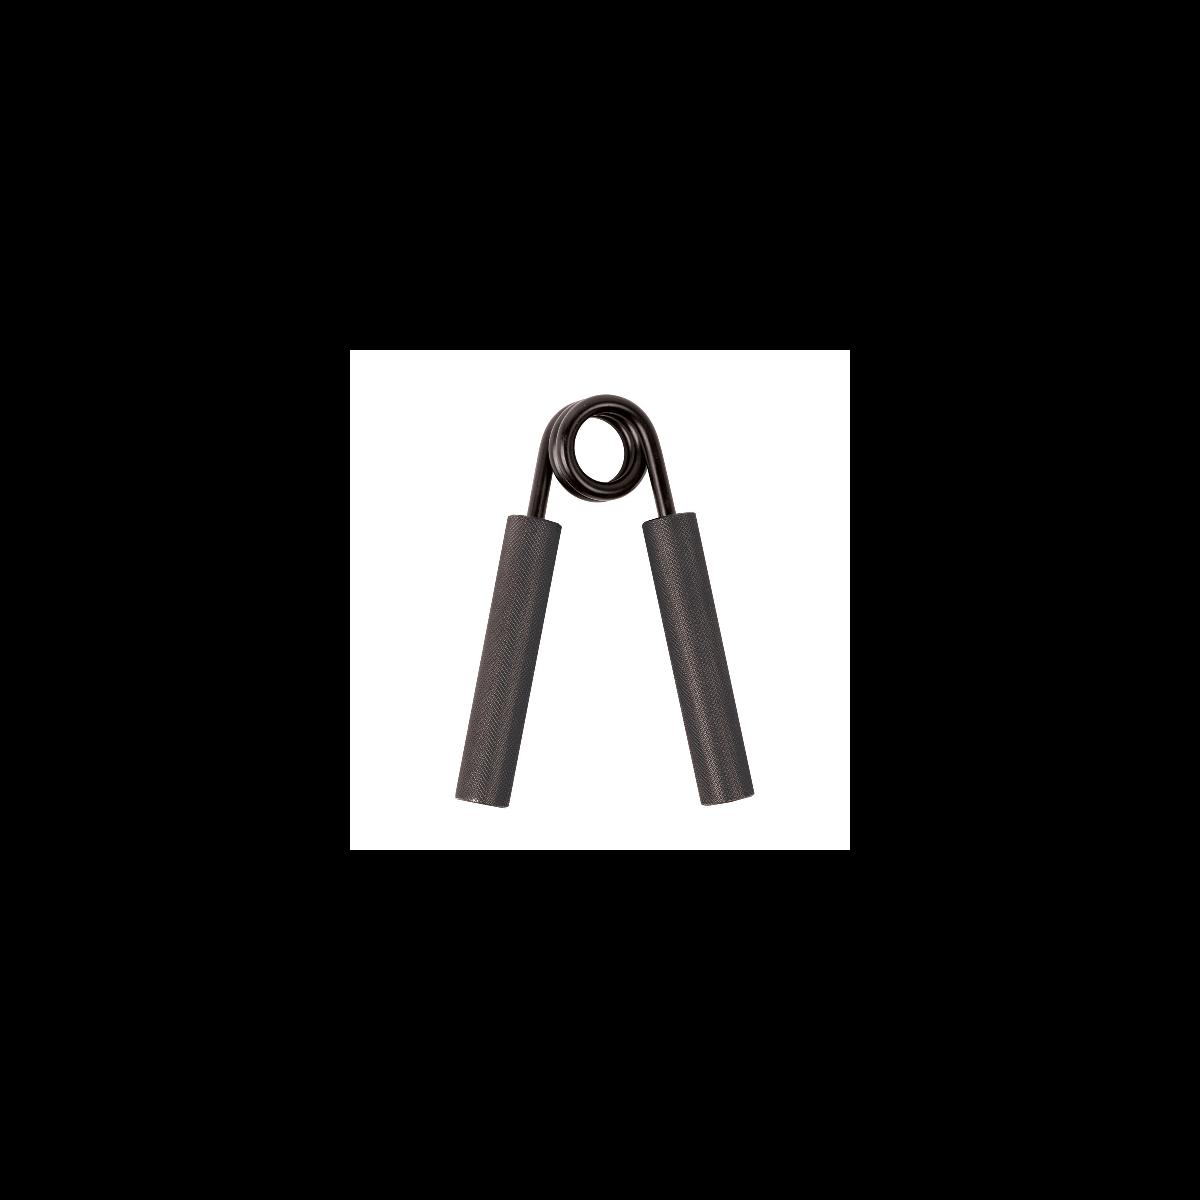 ALUMINIUM HAND GRIP - EXTRA STRONG